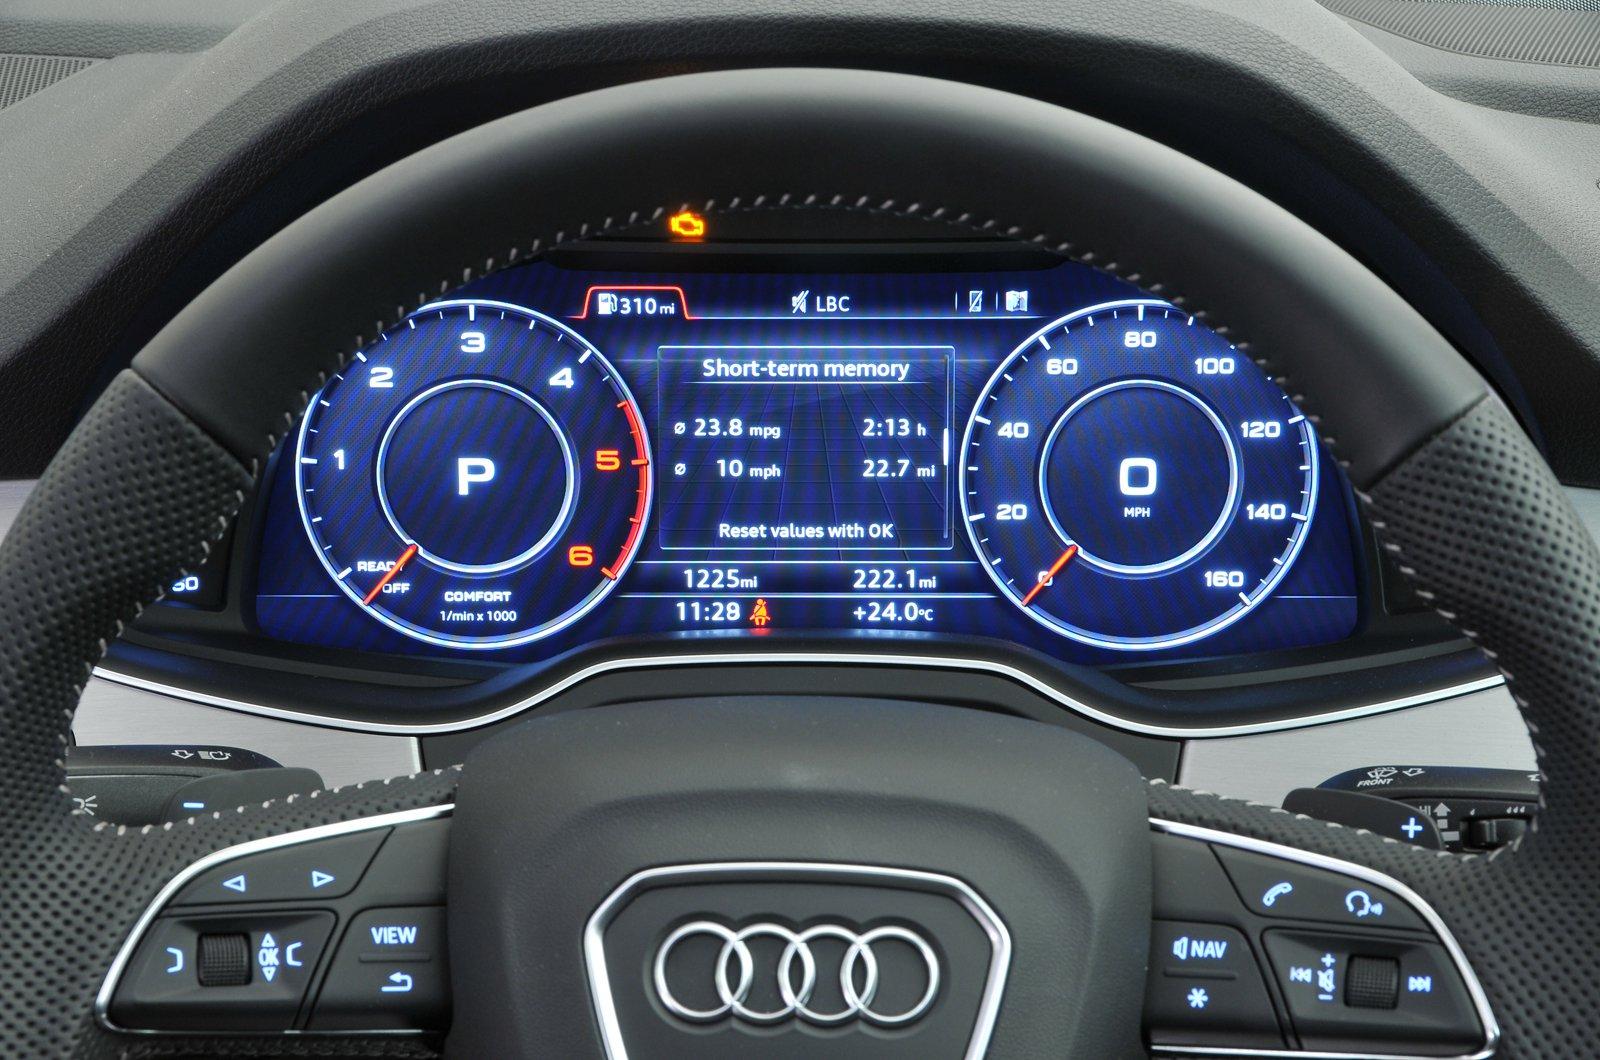 Audi Q7 instruments - 67-plate car